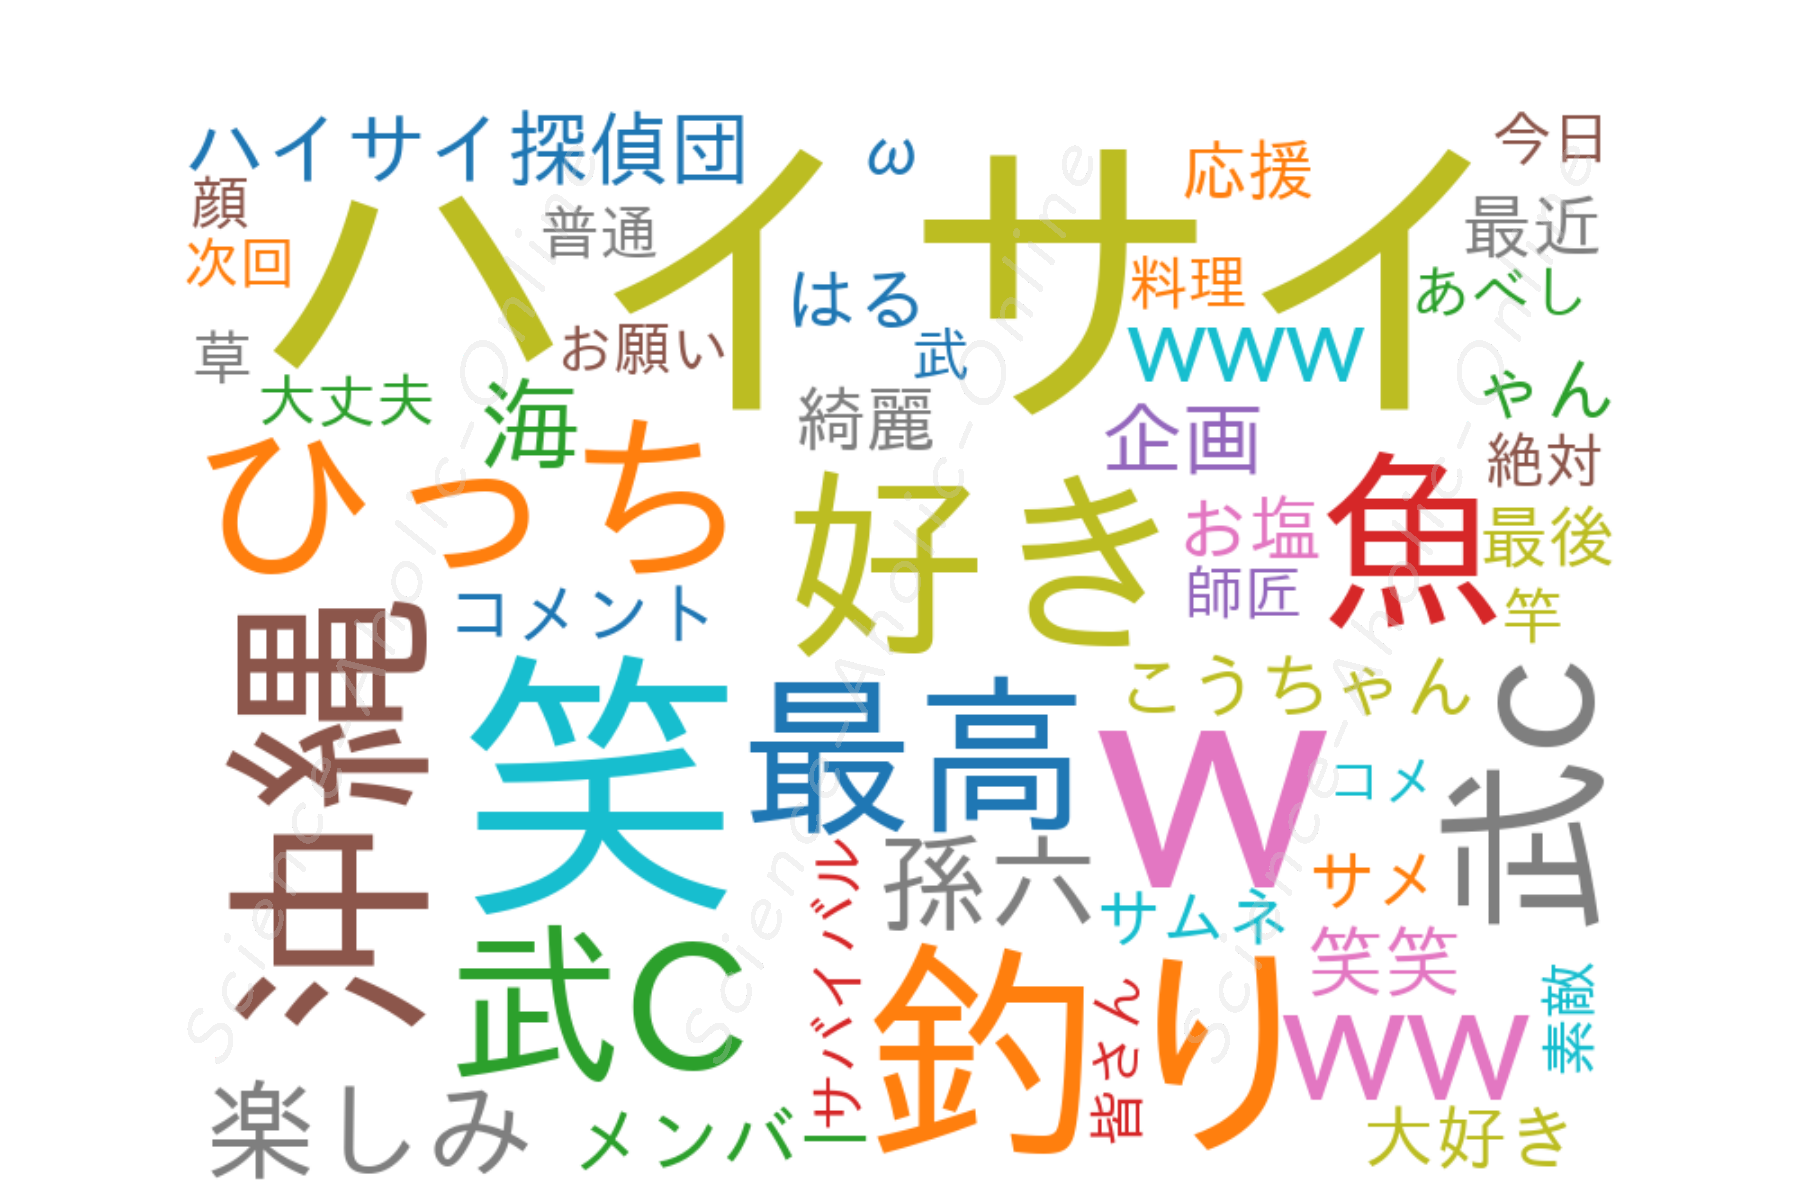 wordcloud_ハイサイ探偵団